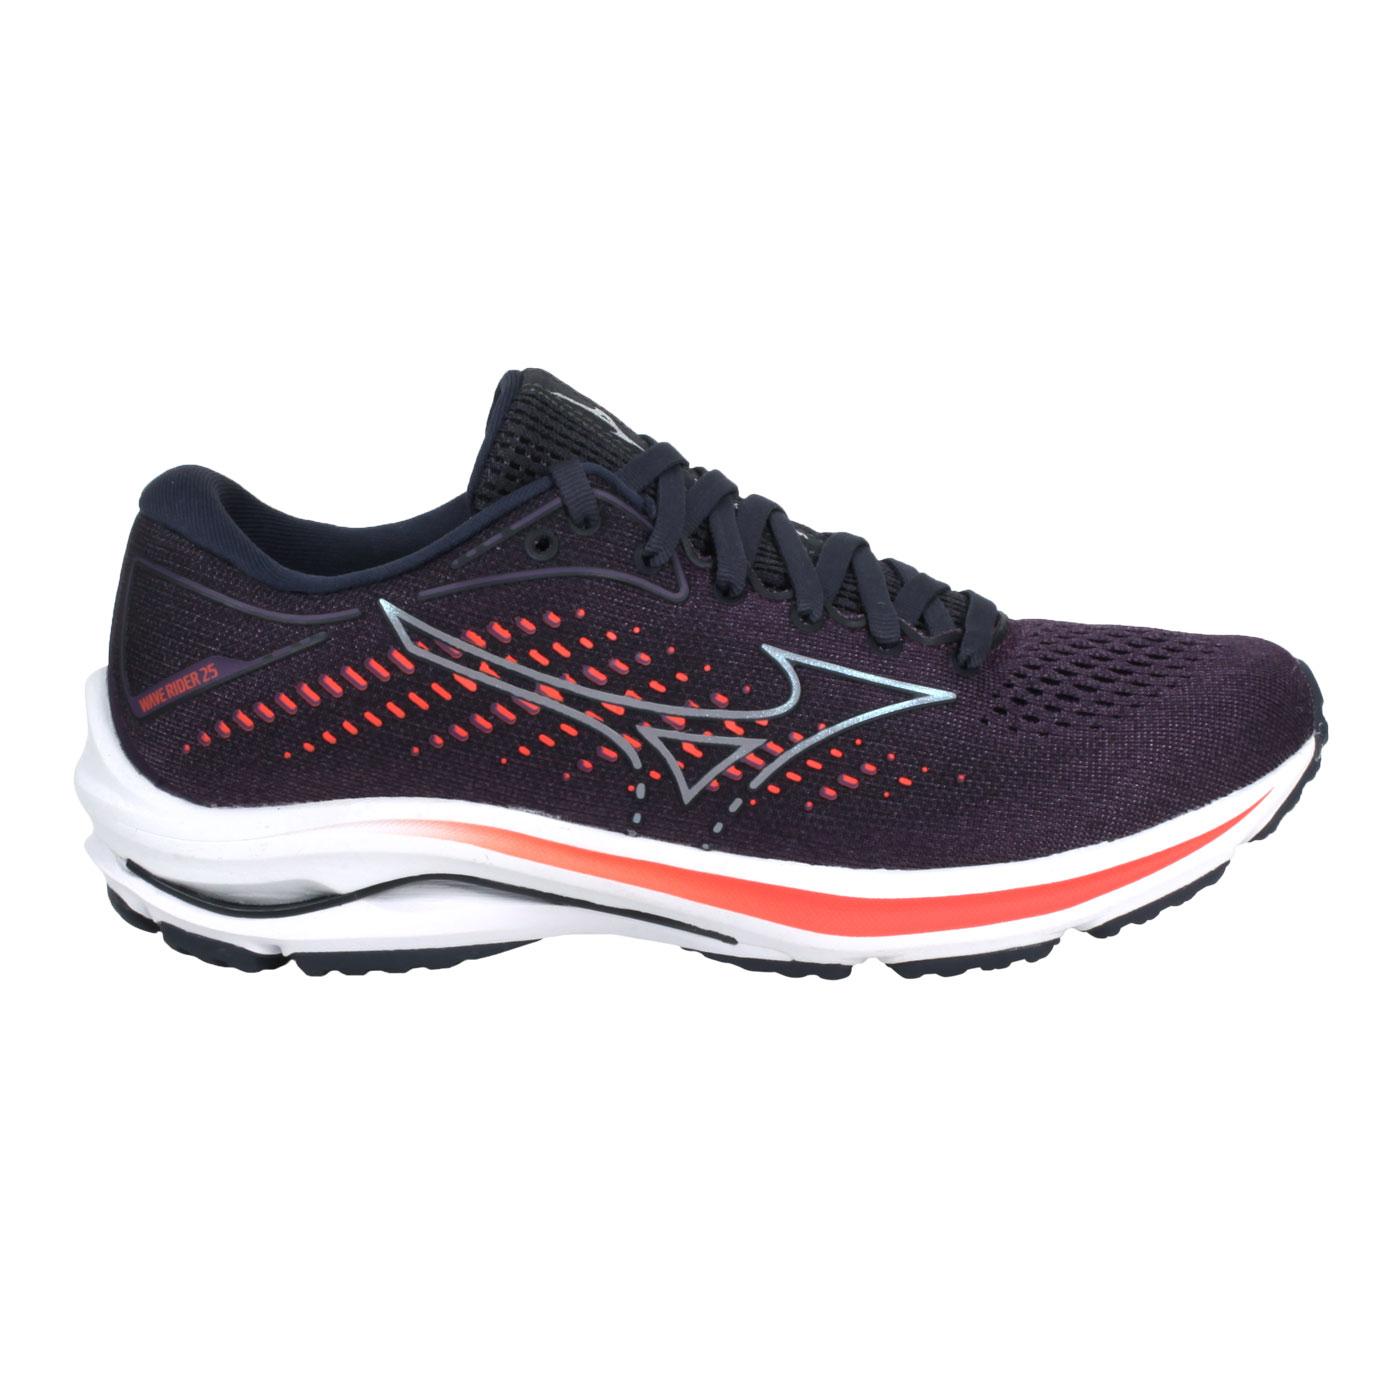 MIZUNO 特定-女款慢跑鞋  @WAVE RIDER 25@J1GD210358 - 深紫橘